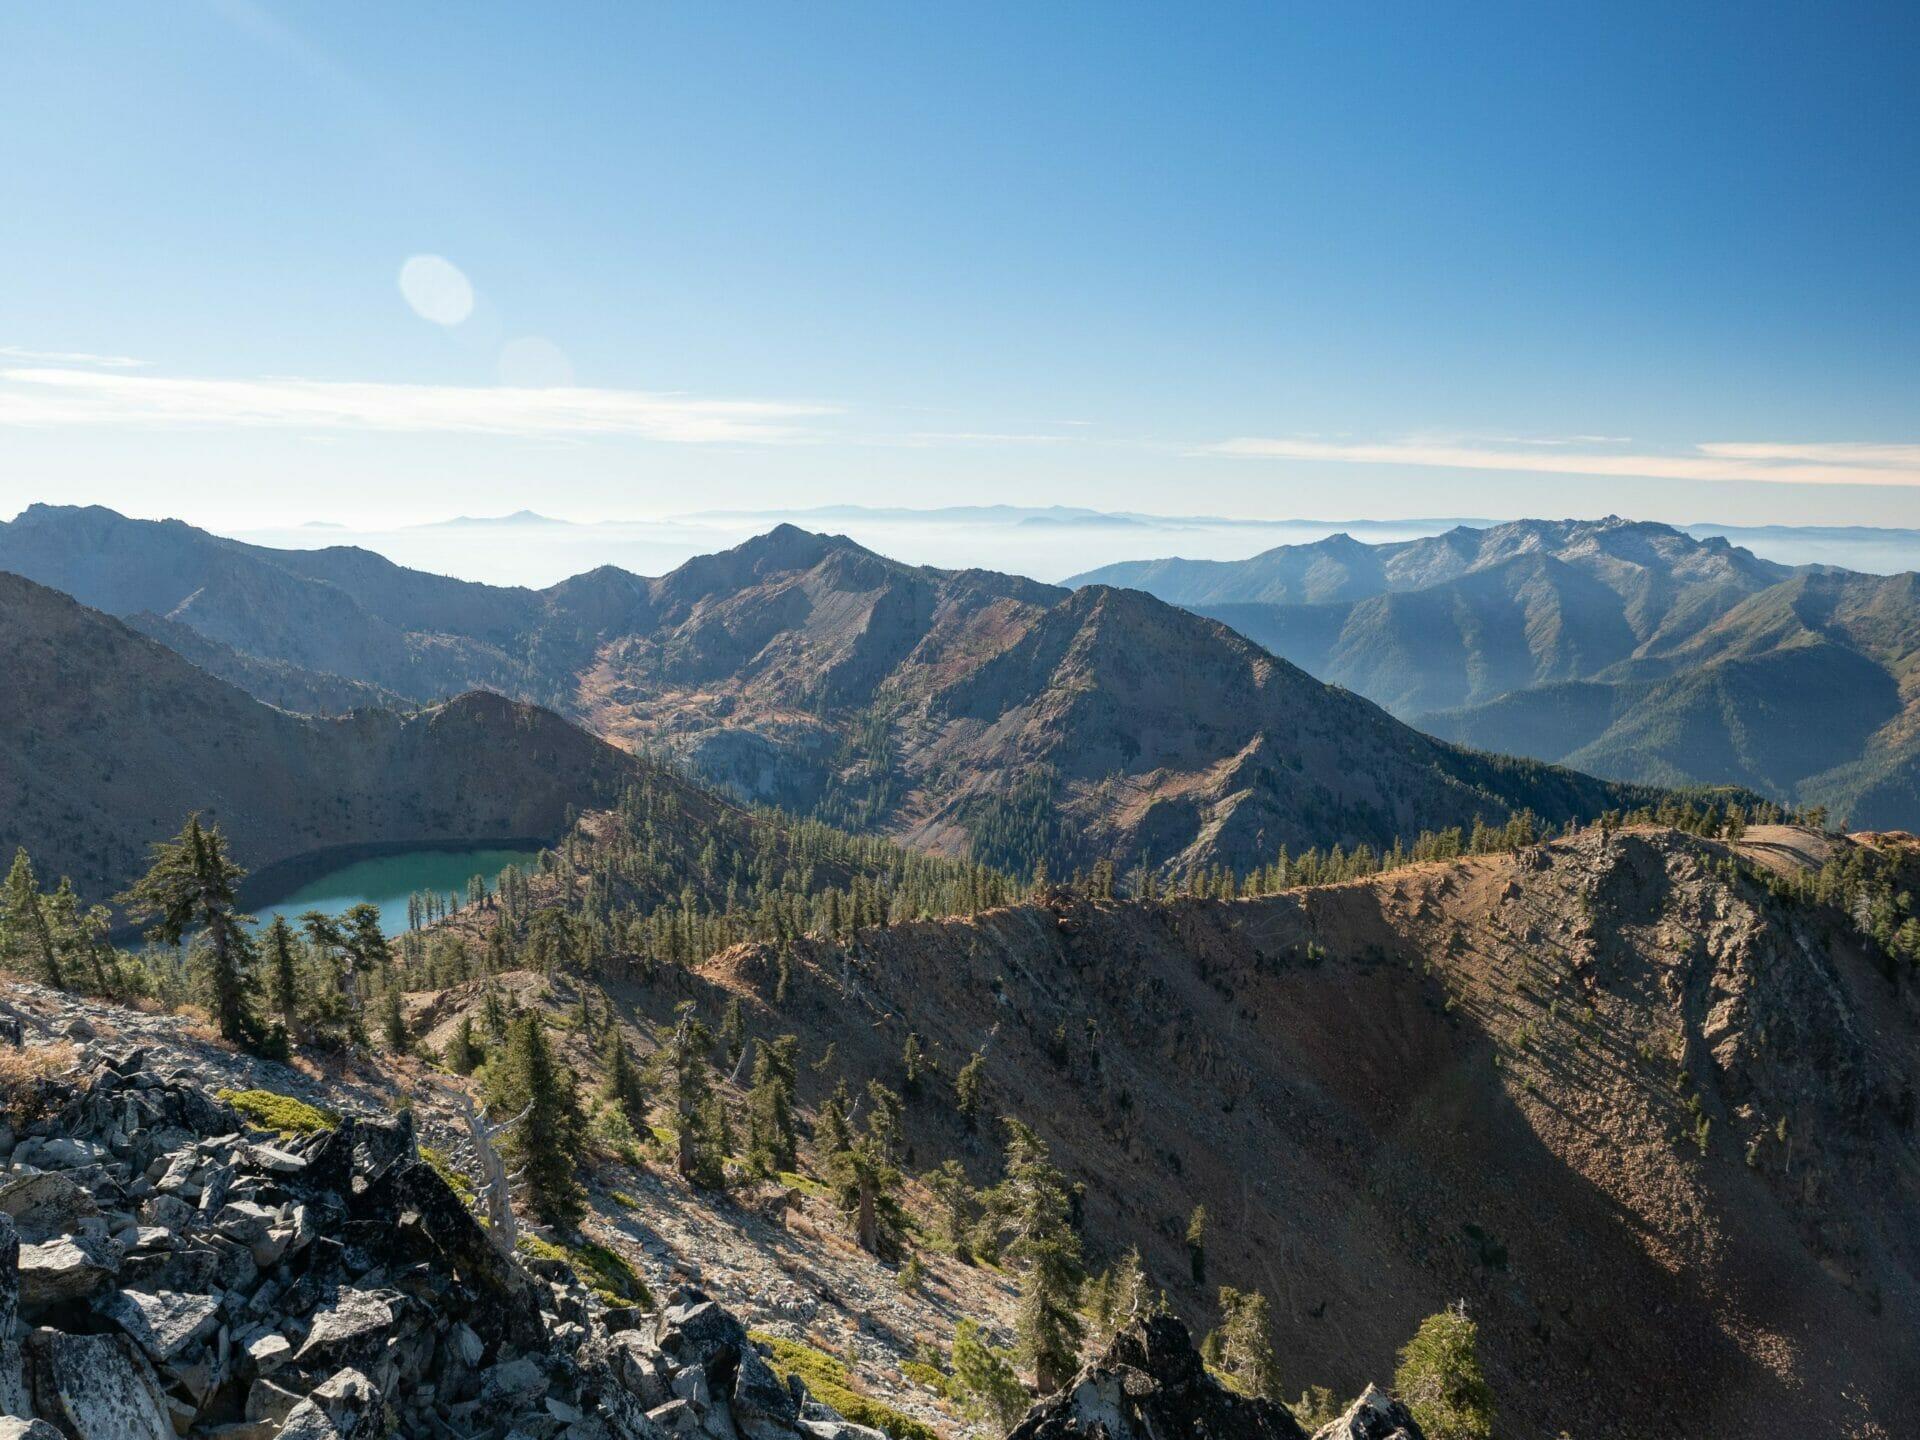 Trinity Alps Four Lakes Loop hike